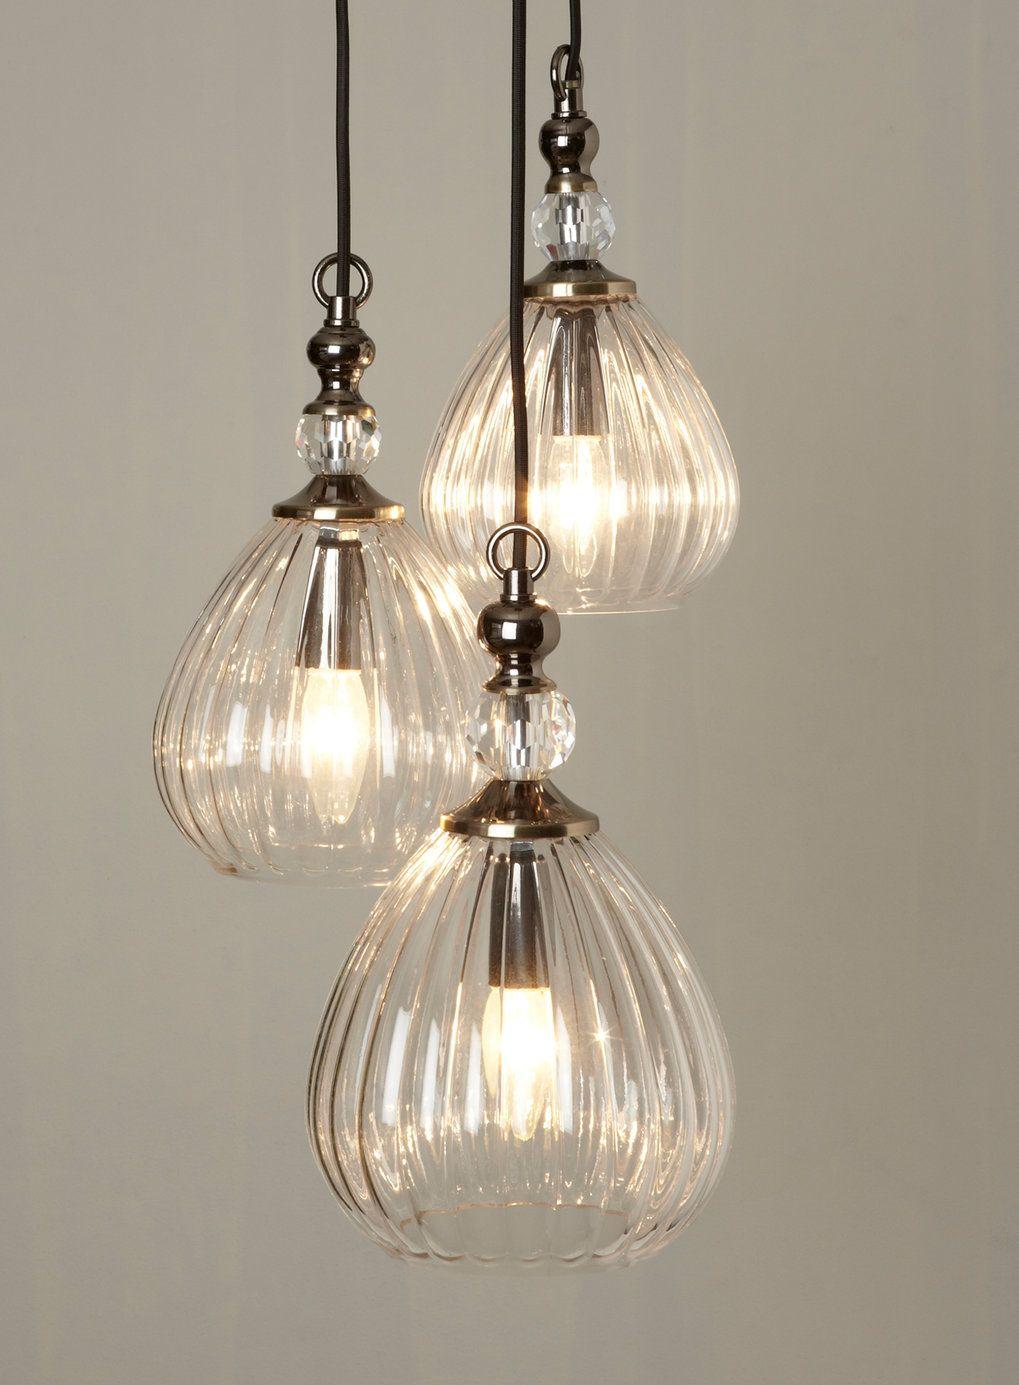 Mirielle 3 Light Cluster Ceiling Lights Home, Lighting